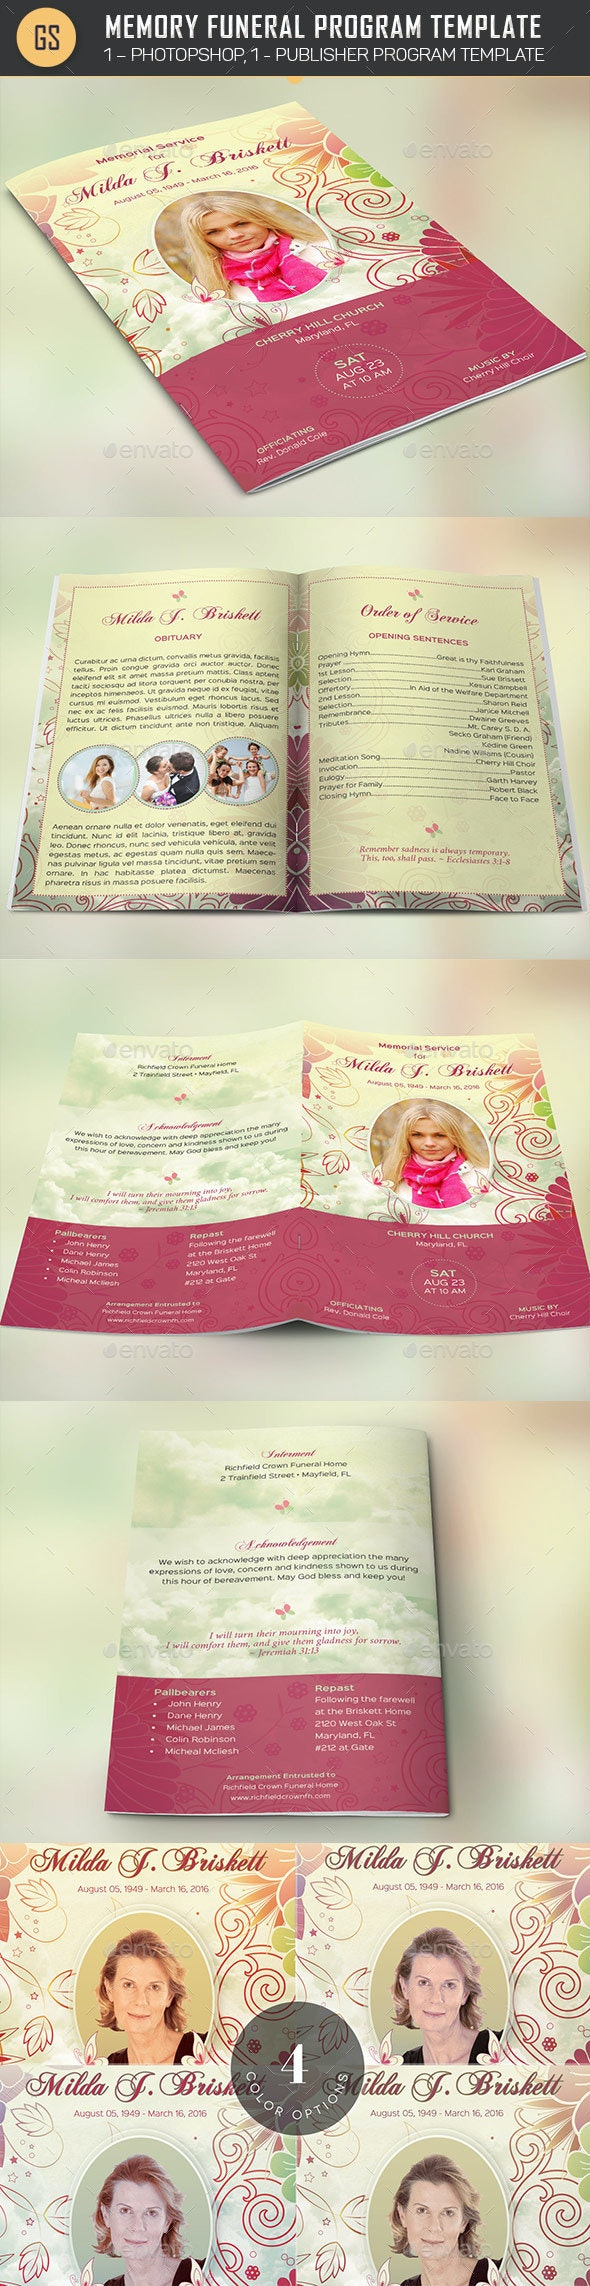 Memory Funeral Program Template - Informational Brochures